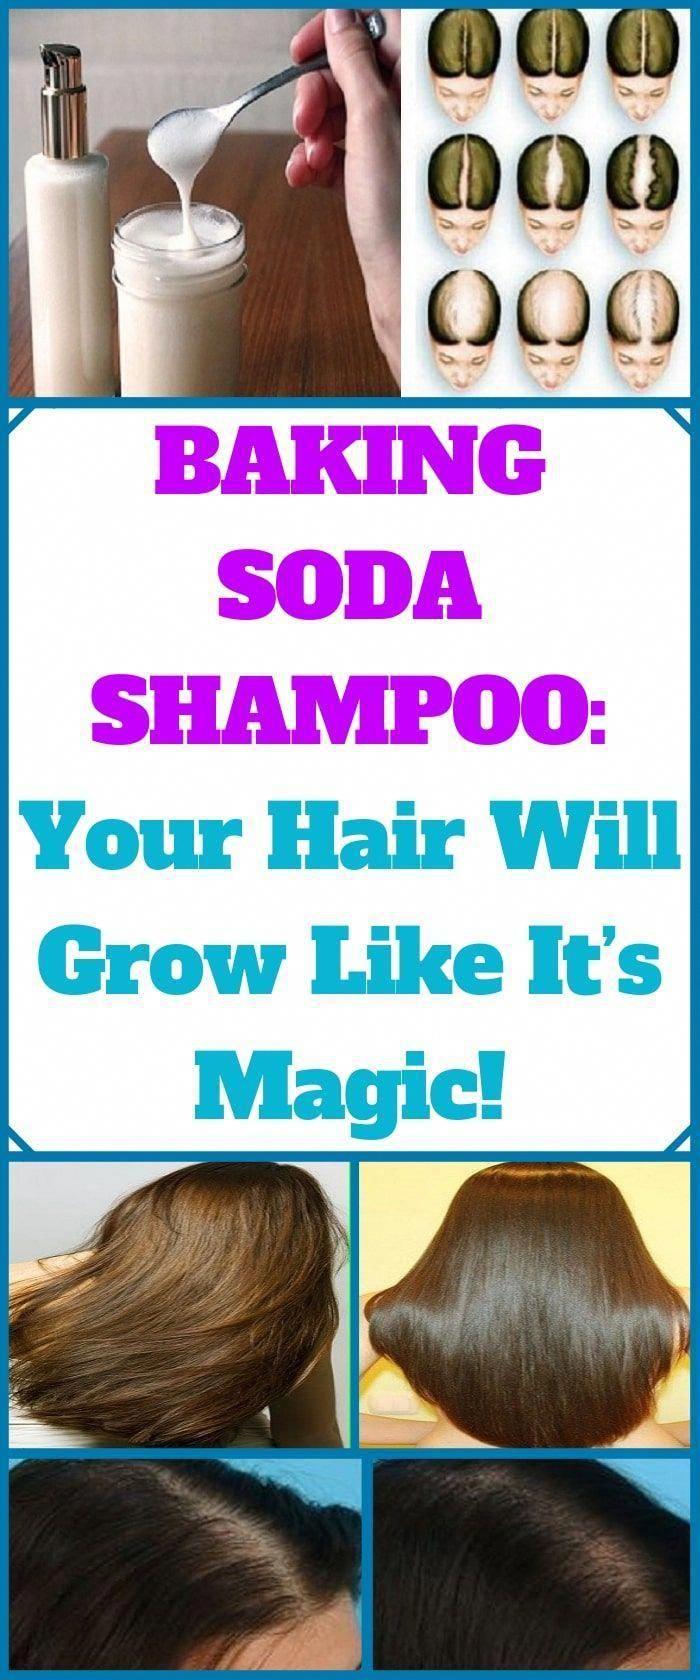 Baking Soda Shampoo It Will Make Your Hair Develop Like It